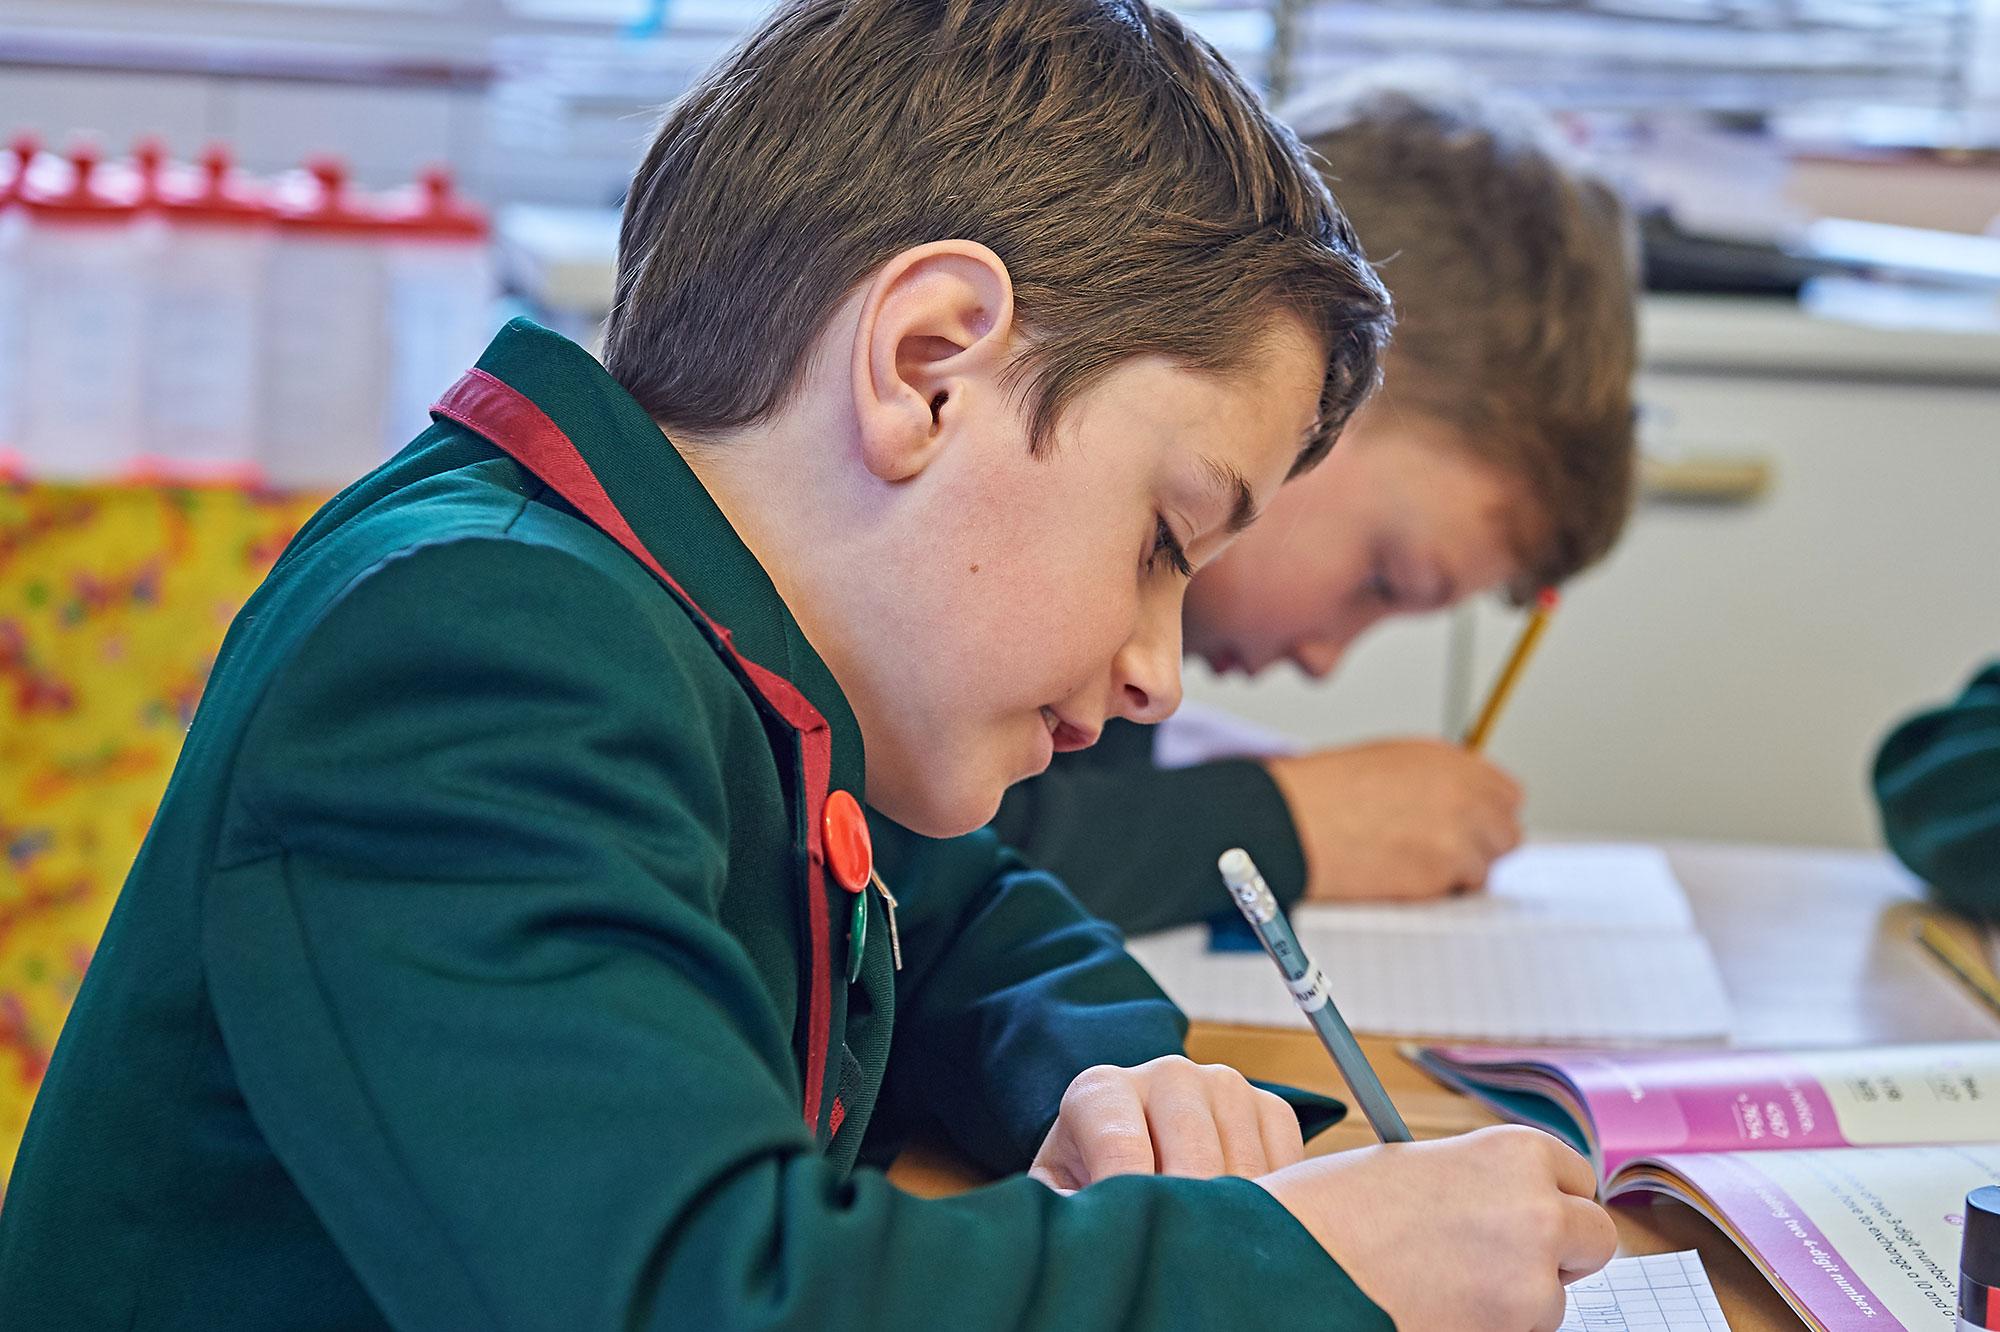 Maldon Court Preparatory School Essex